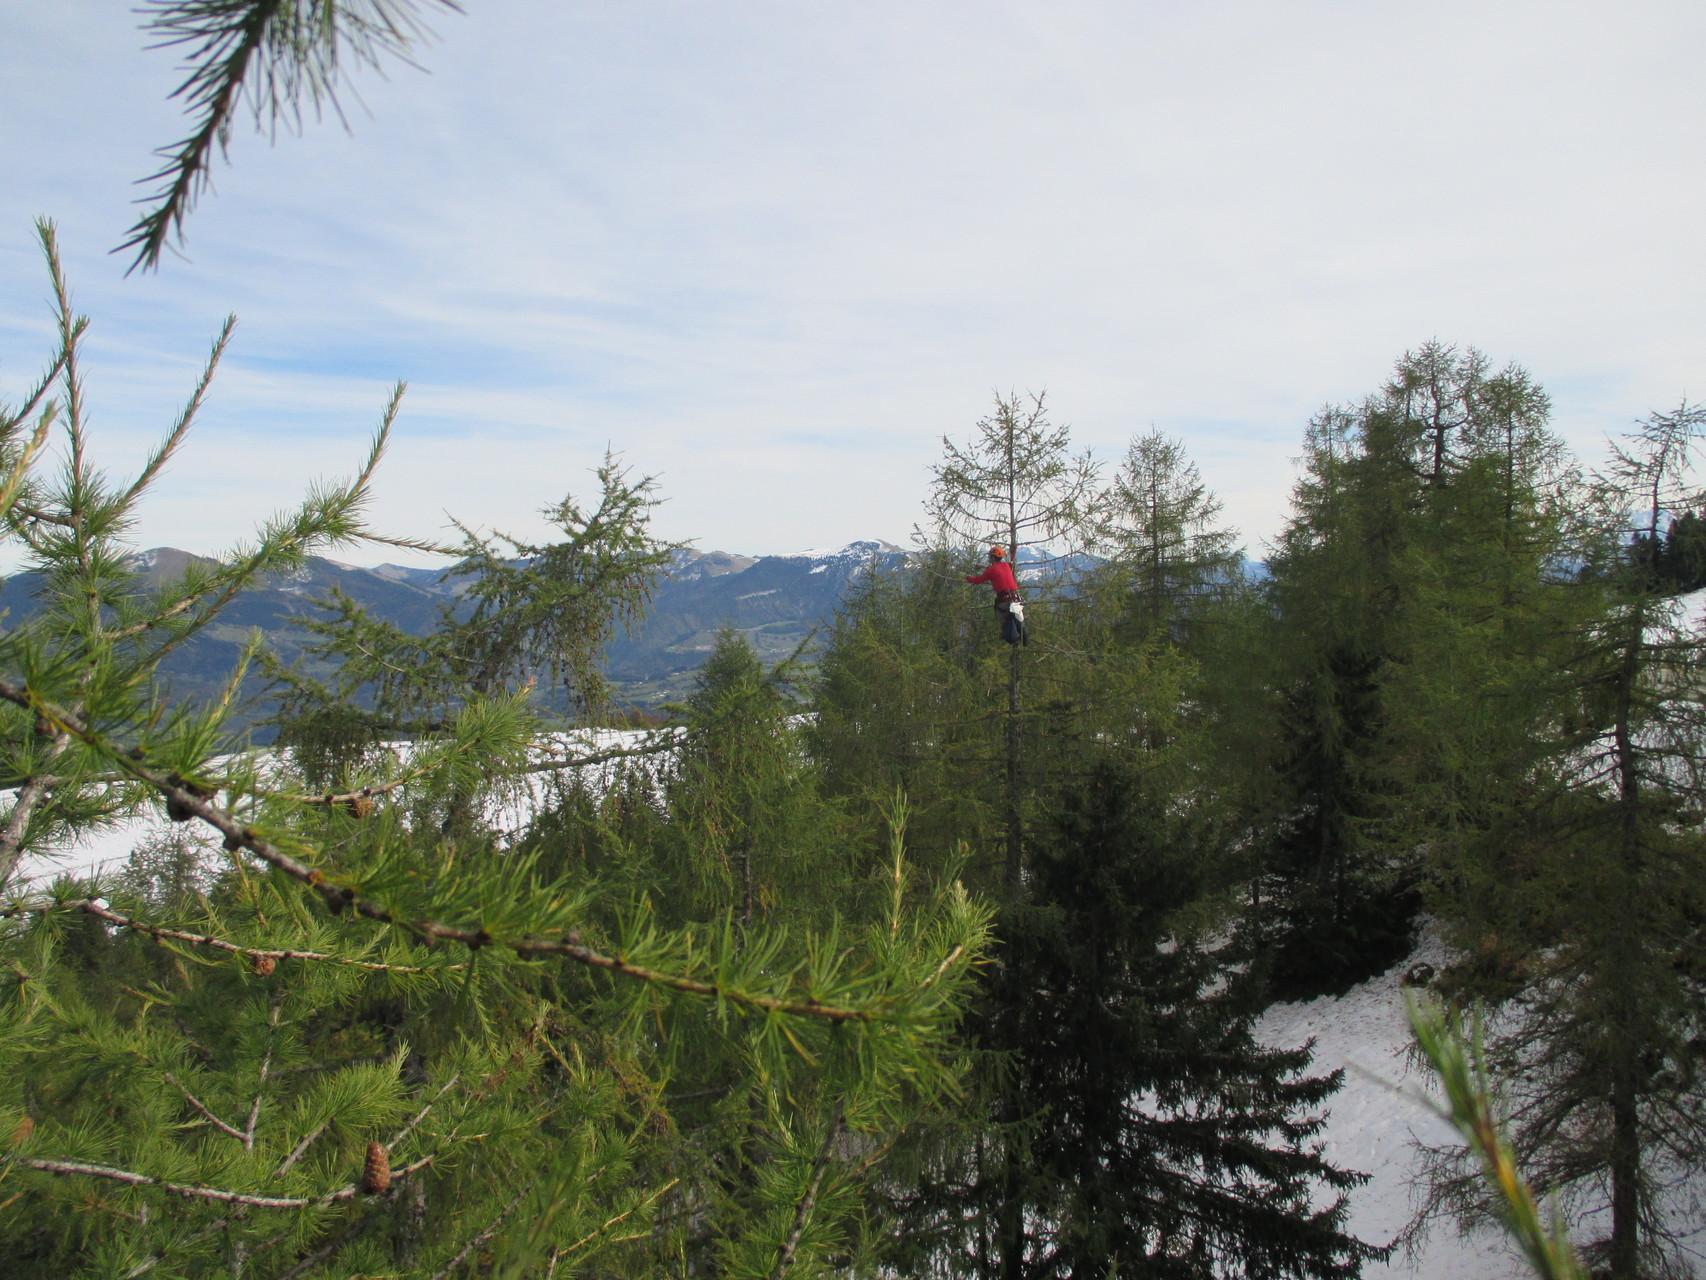 Zapfenpflücken am Rossfeld bei Berchtesgaden